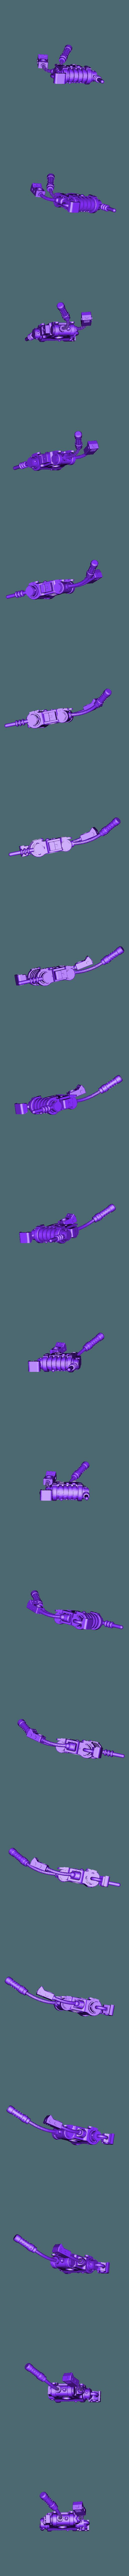 Reposed_Ranger_2.1_-_Backpack_scaled.stl Download free STL file Martian Mechanized Rangers • 3D printable object, ErikTheHeretek